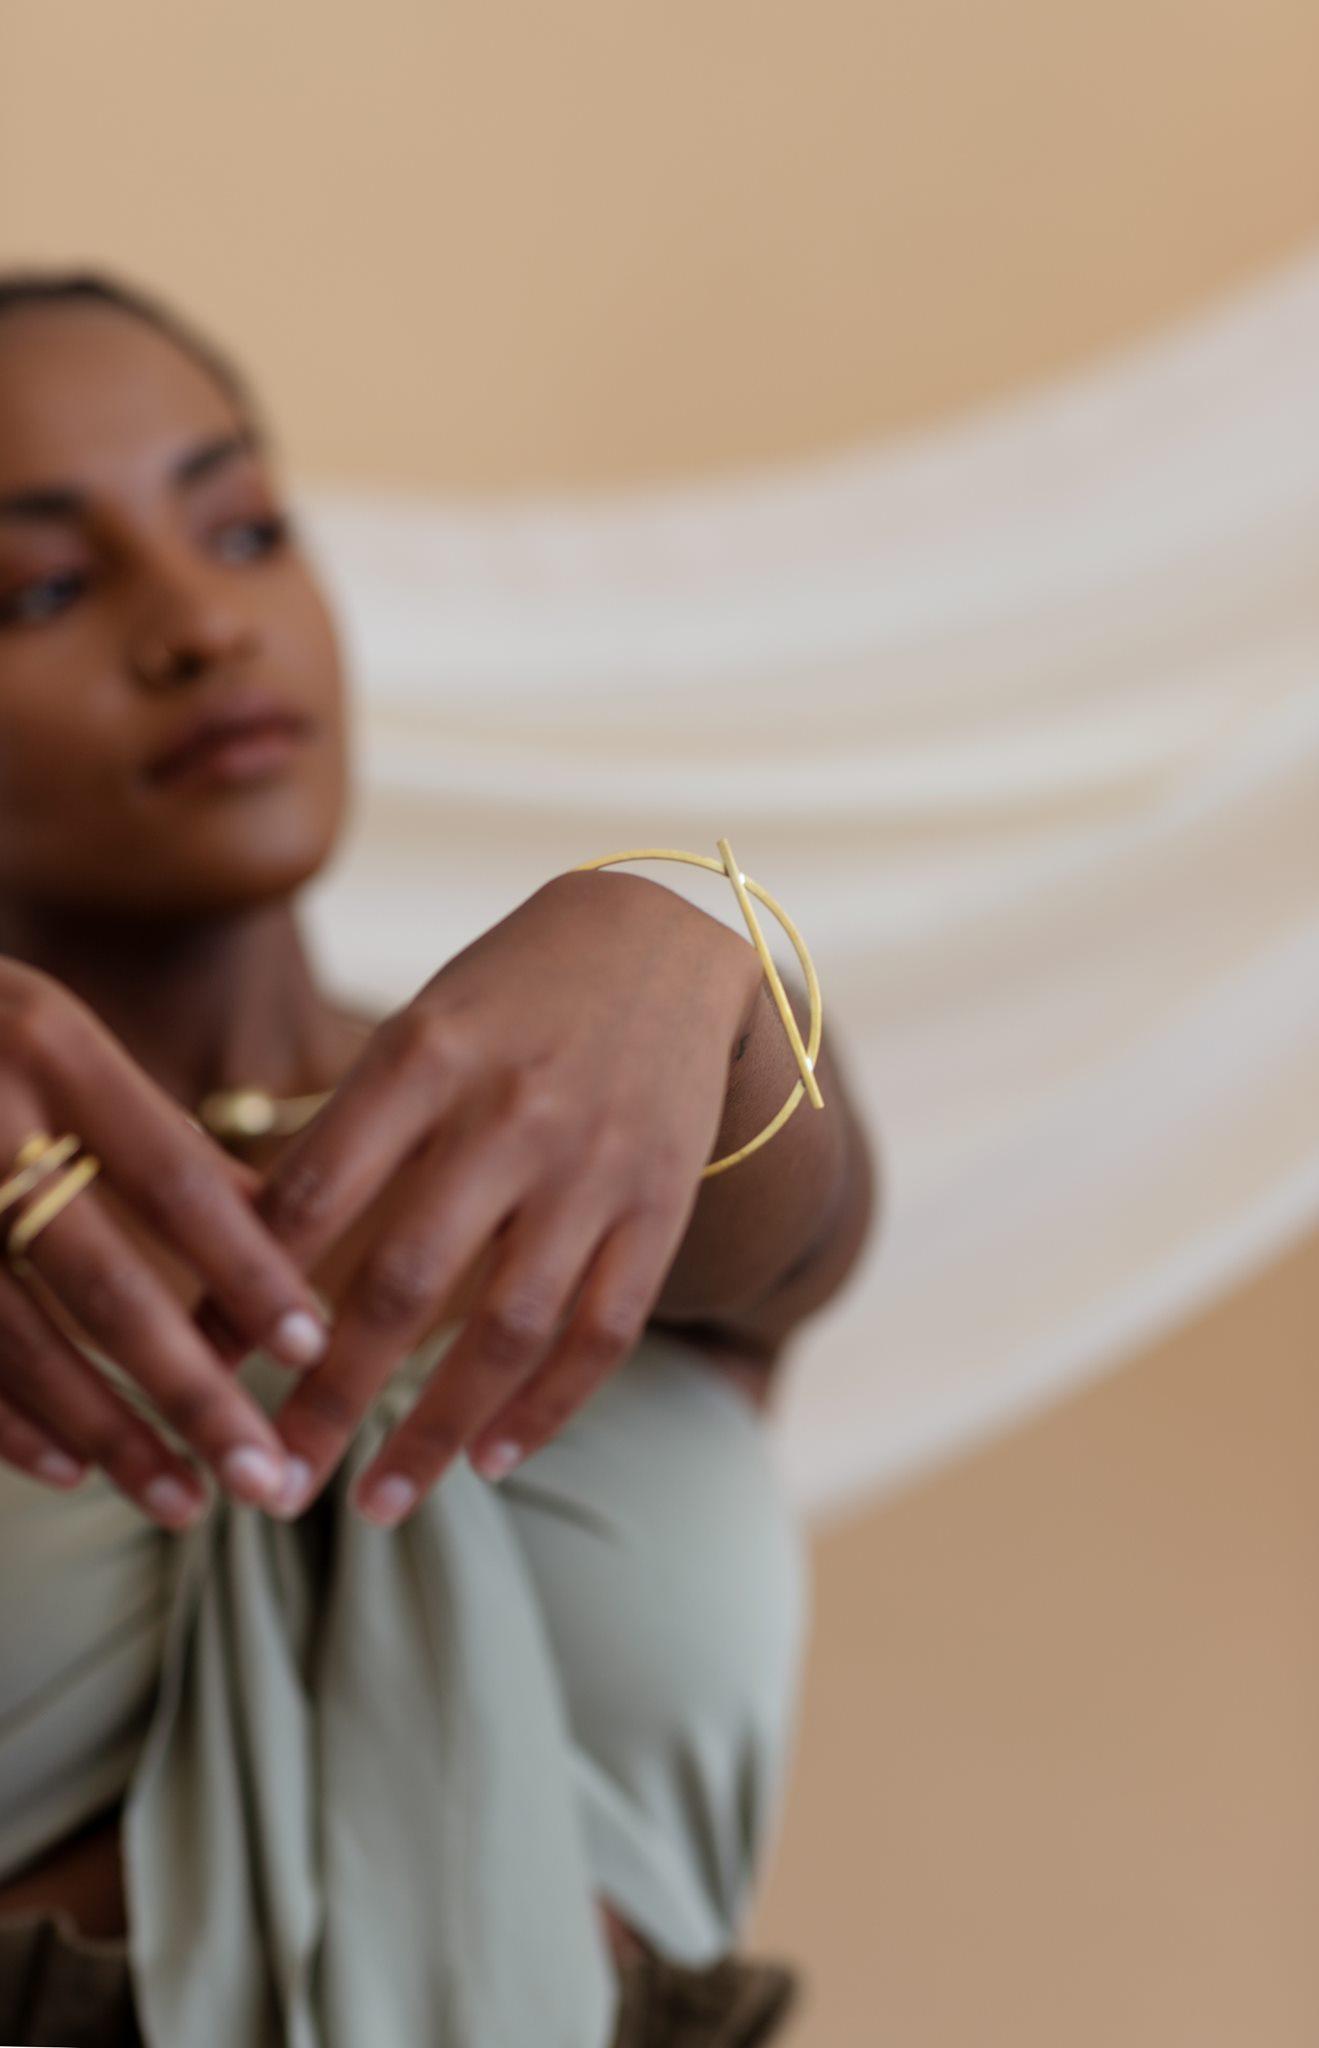 minimal bronze bracelet sustainable artisan jewelry nepal portland maine fair-wage modern jewelry mulxiply